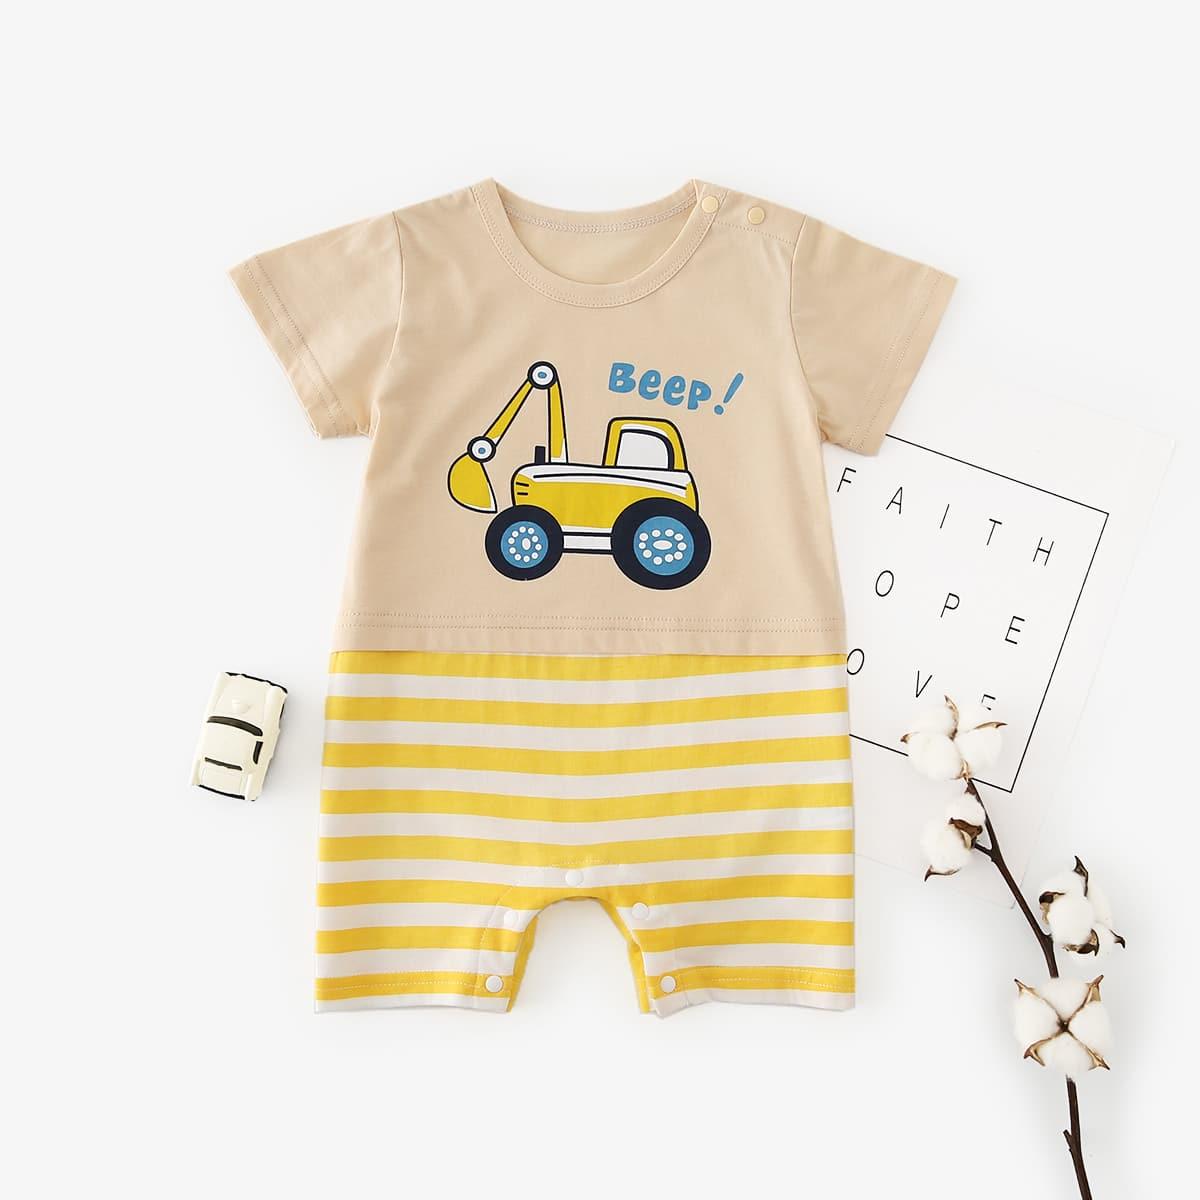 буква Комбинезоны для малышей